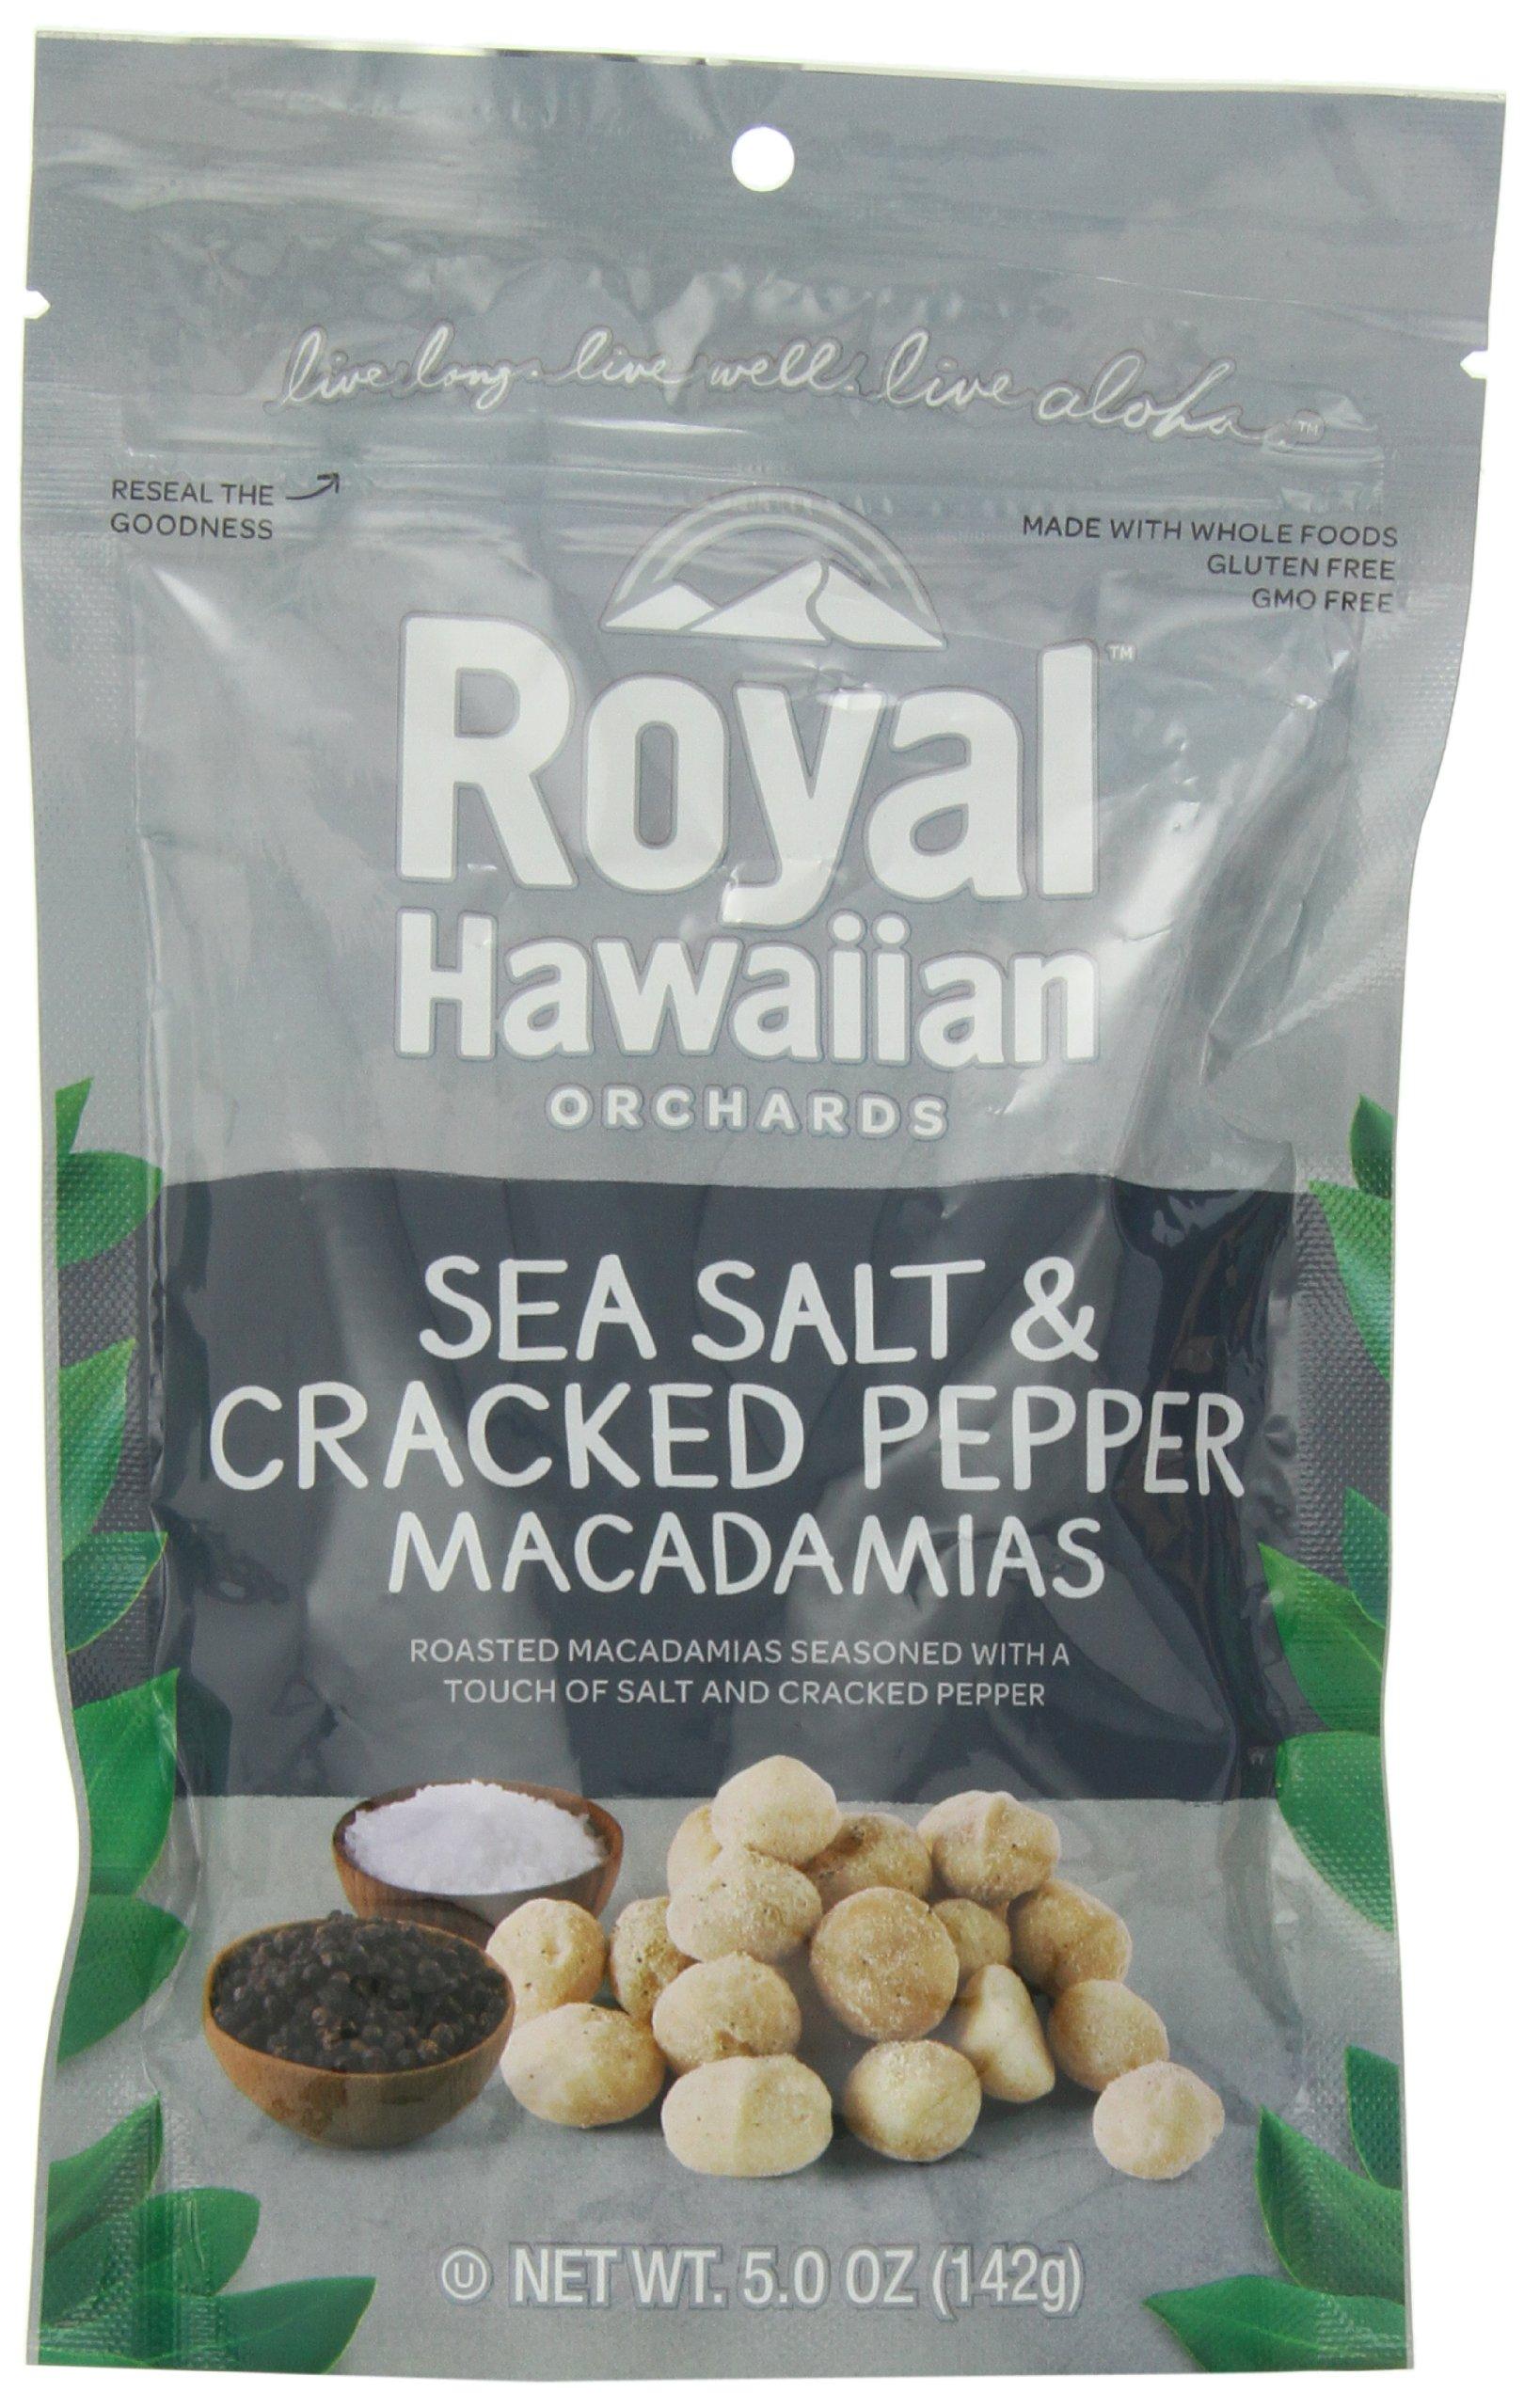 Royal Hawaiian Orchards Macadamias, Sea Salt and Cracked Pepper, 5 Ounce